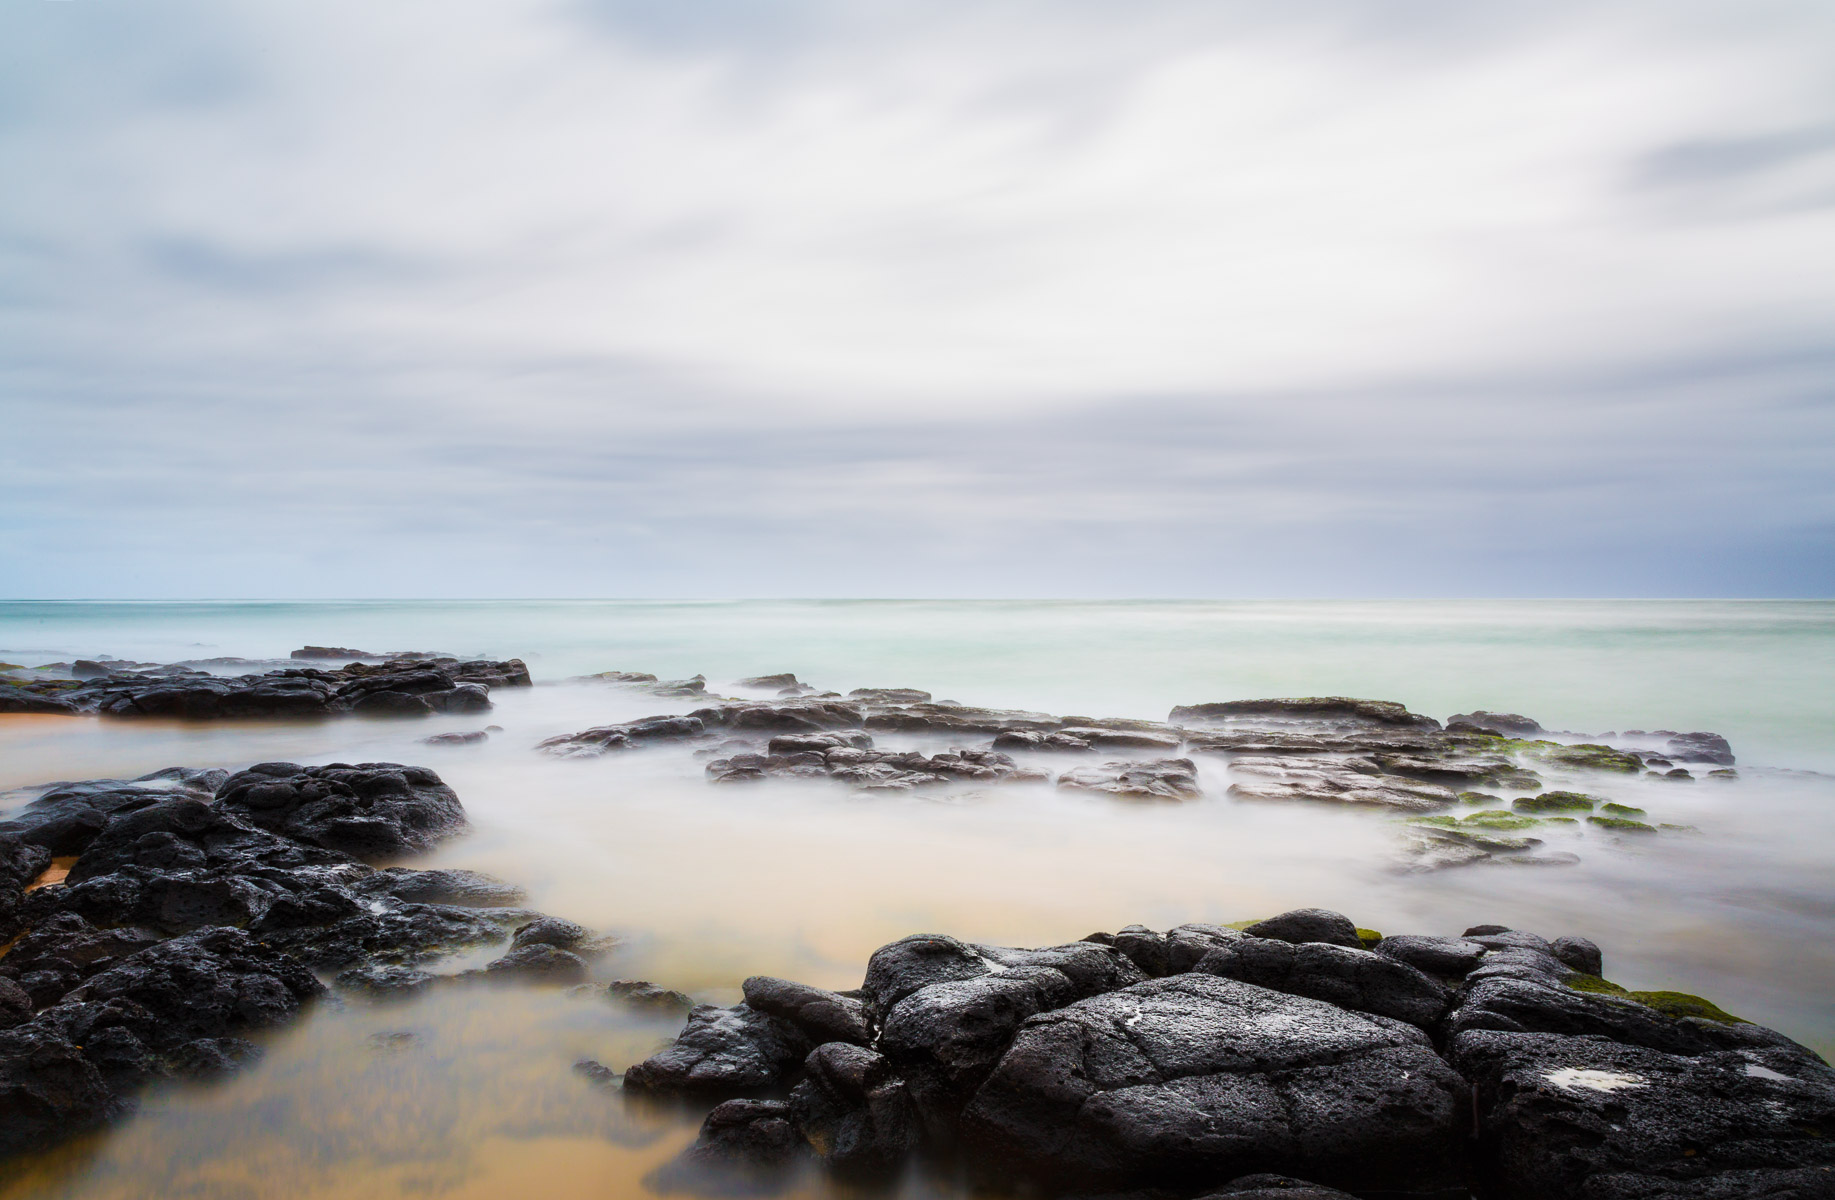 seascape-photography-kauai-kapaa-nd-filter-color.jpg